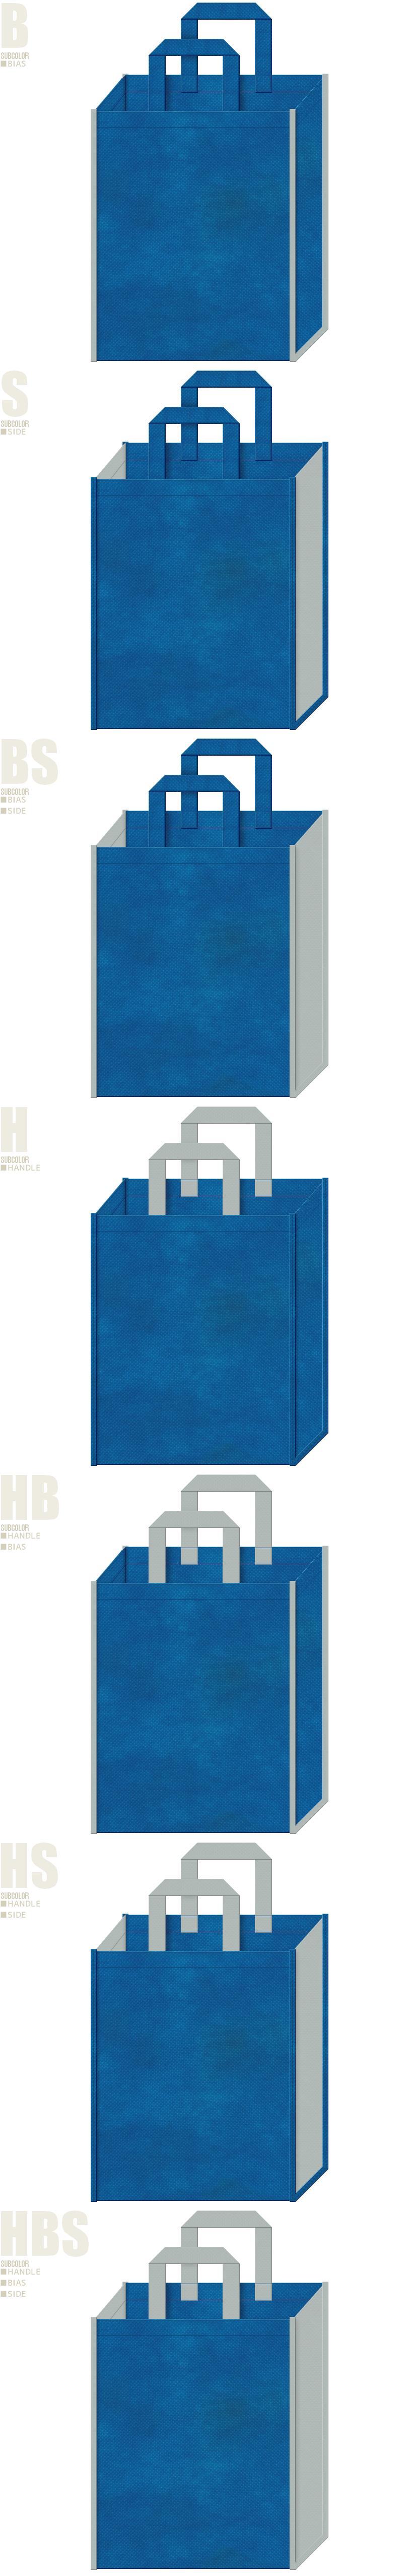 IT・AI・LED・IOT・センサー・電子部品・ロボット・ラジコン・ホビー・防犯カメラ・セキュリティの展示会用バッグにお奨めの不織布バッグデザイン:青色とグレー色の配色7パターン